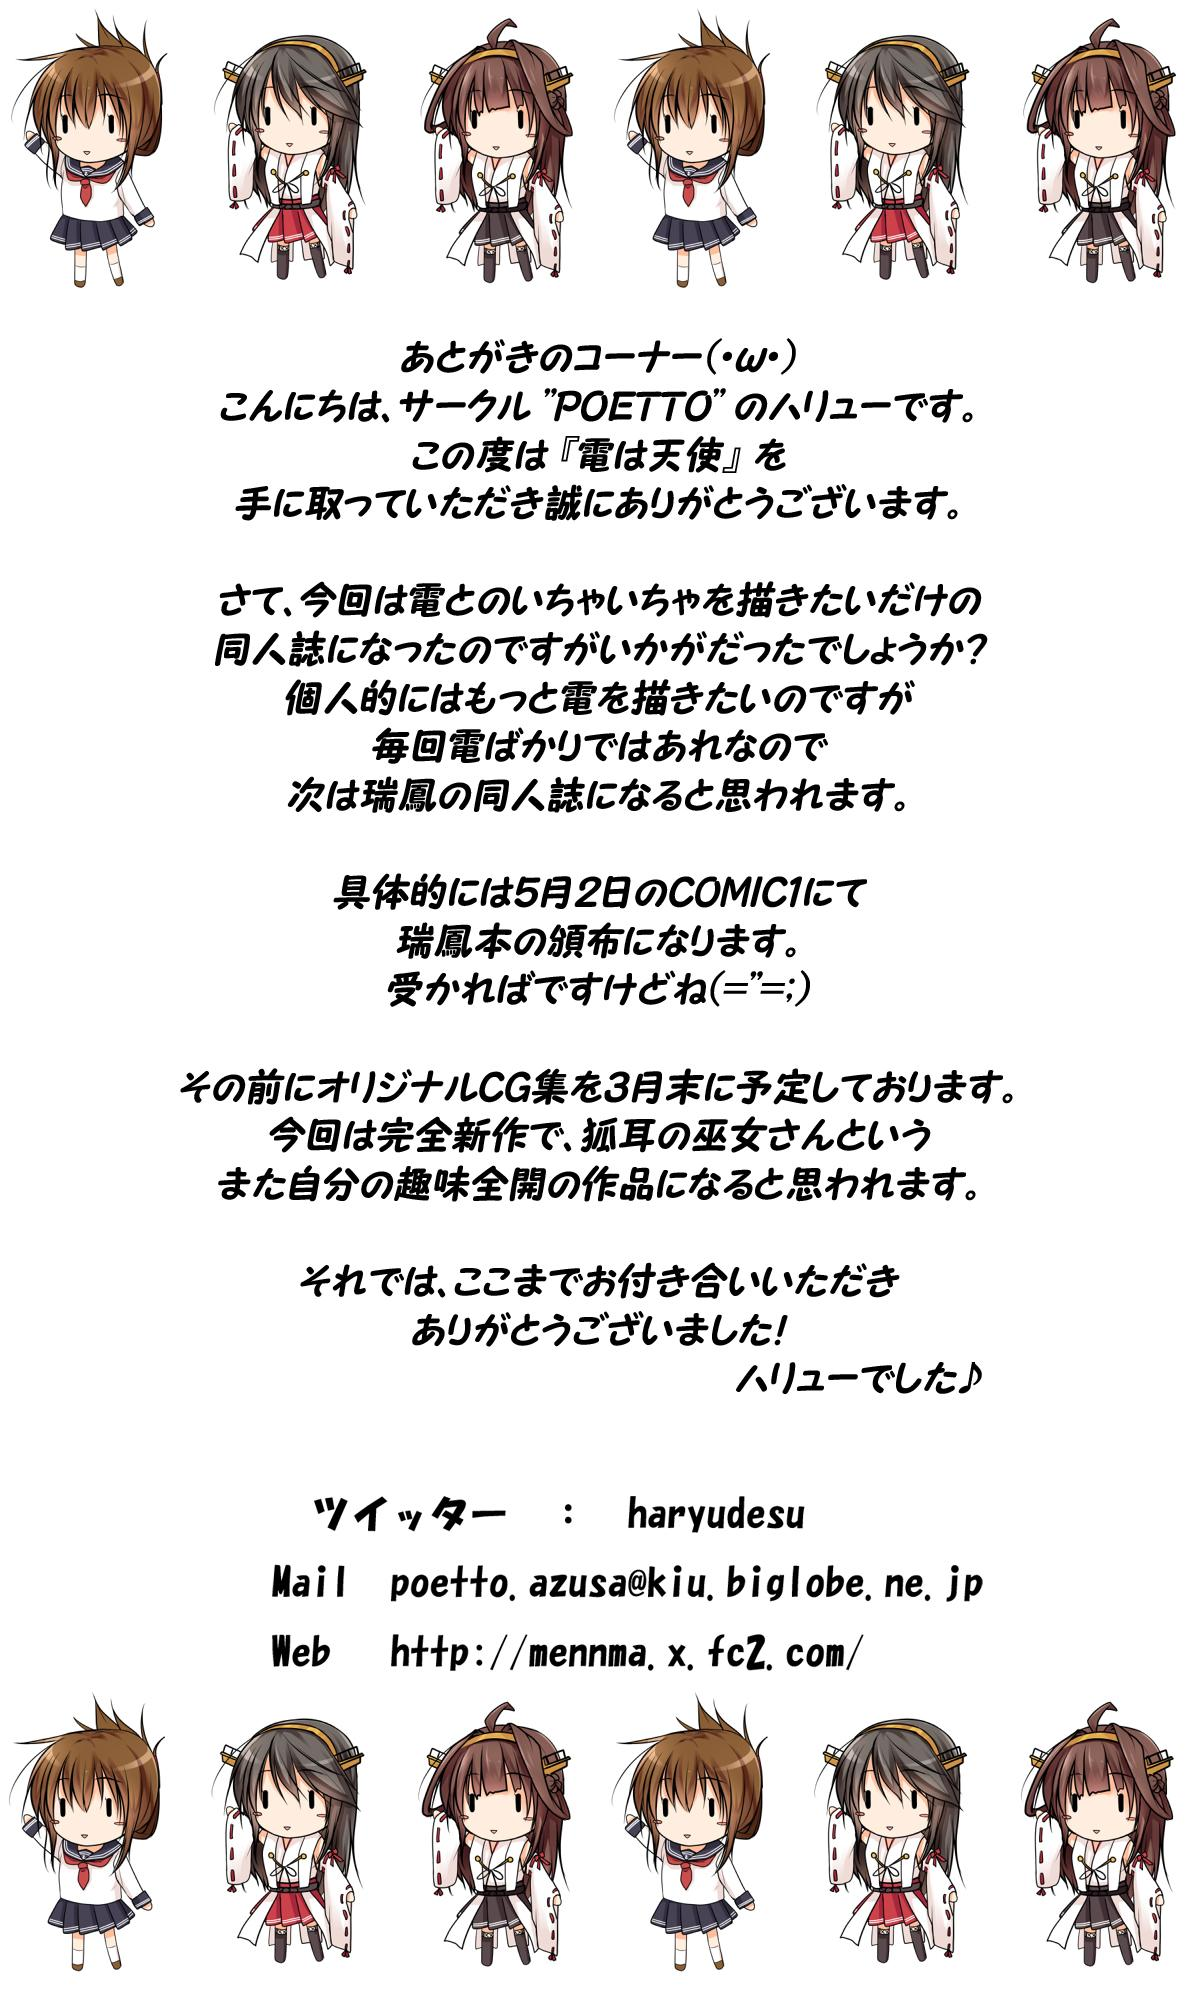 Inazuma wa Tenshi 16